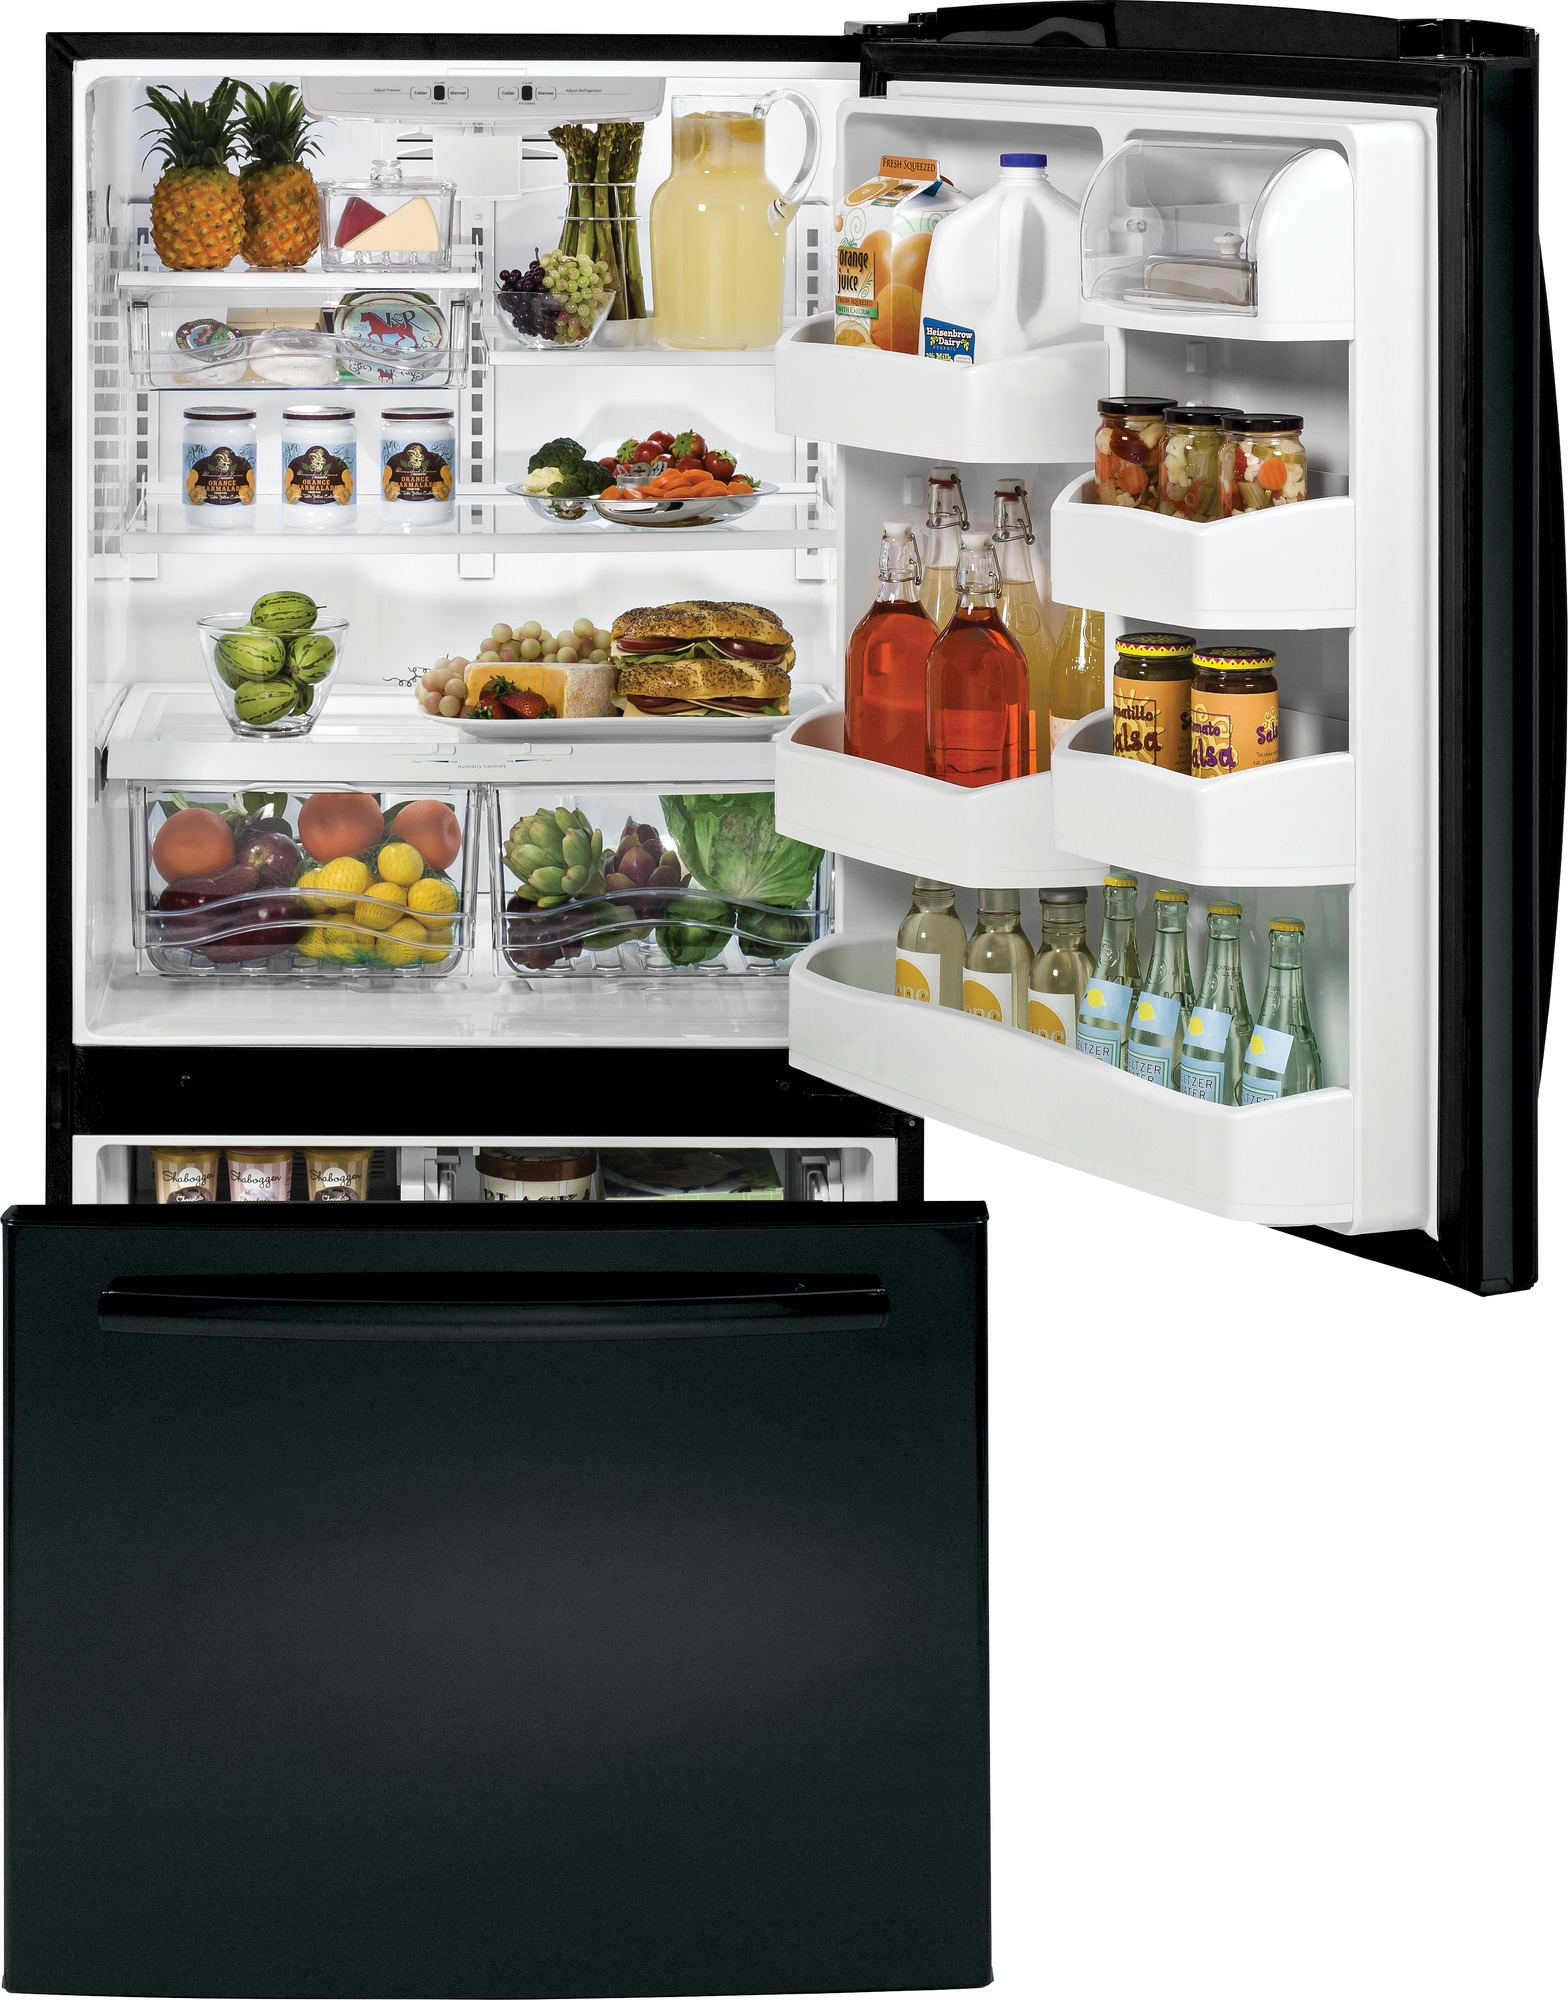 GE Appliances GDE20GGHBB 20.3 cu. ft. Bottom-Freezer Refrigerator - Black